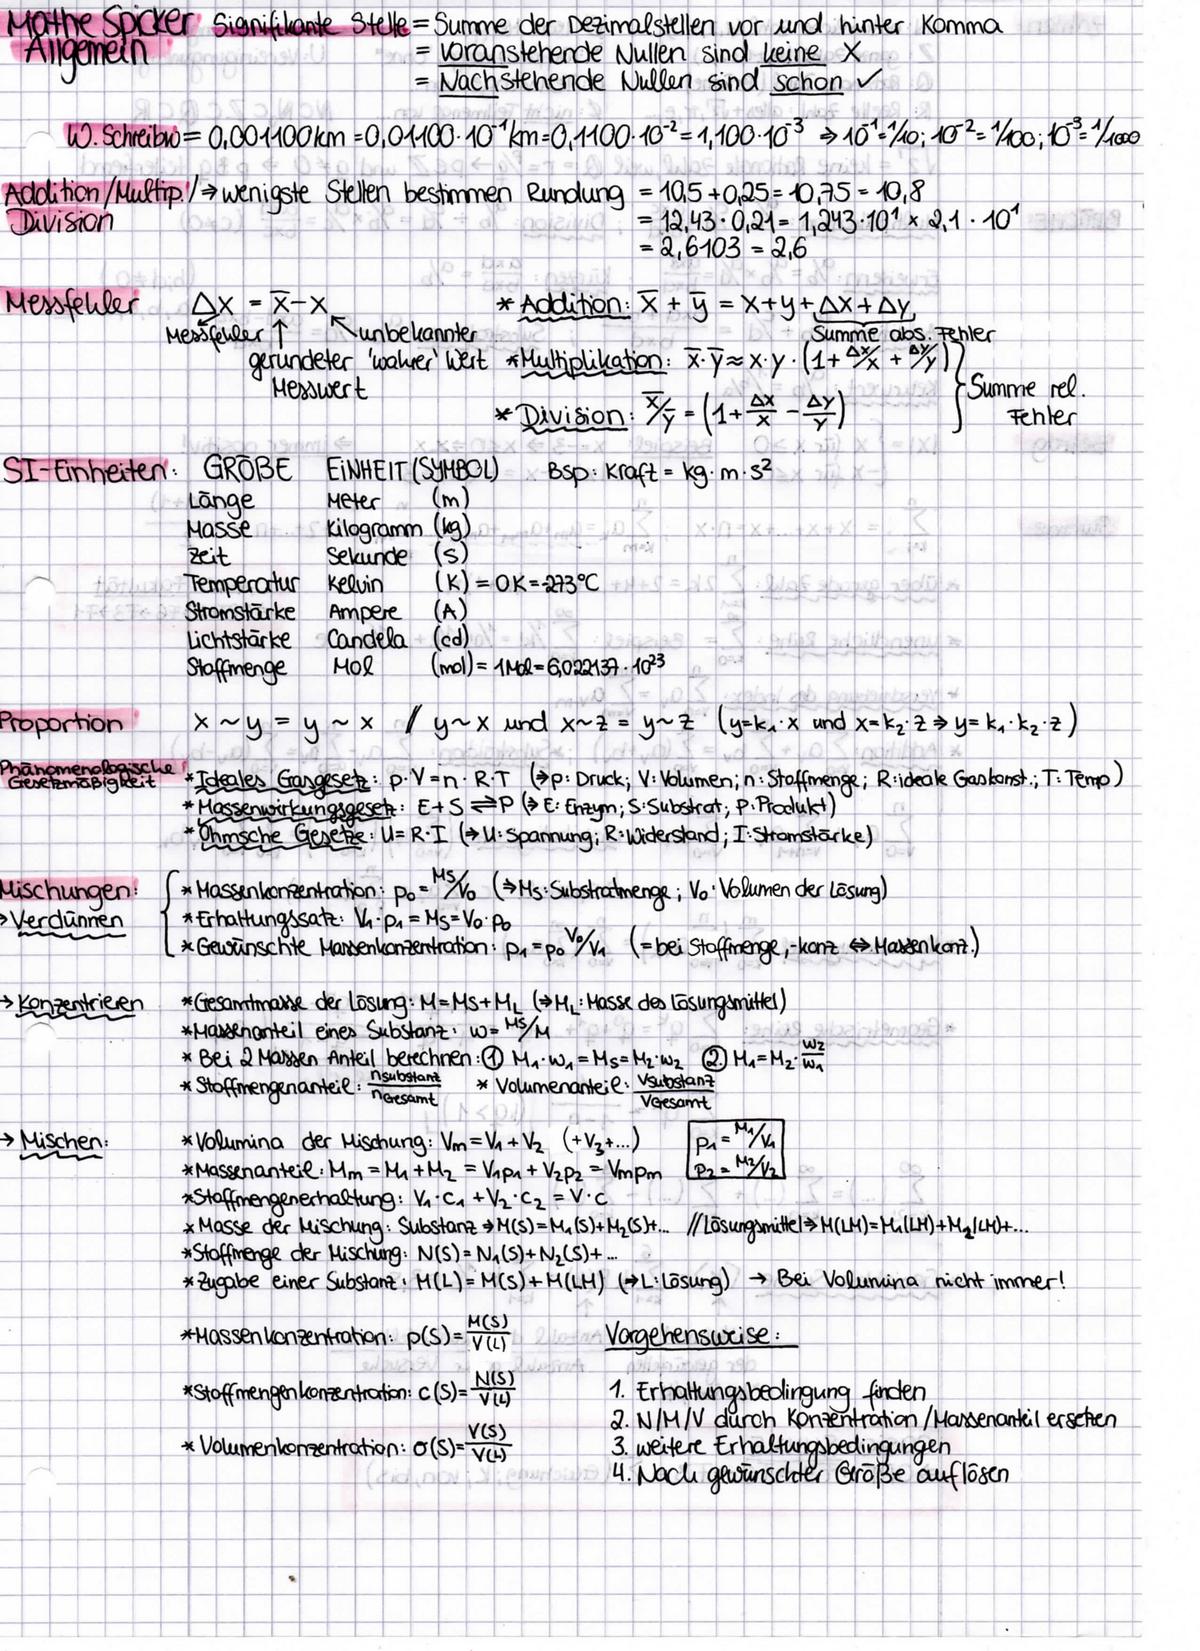 Mathe 001 - Themen: gesamte Analysis, Deskriptive